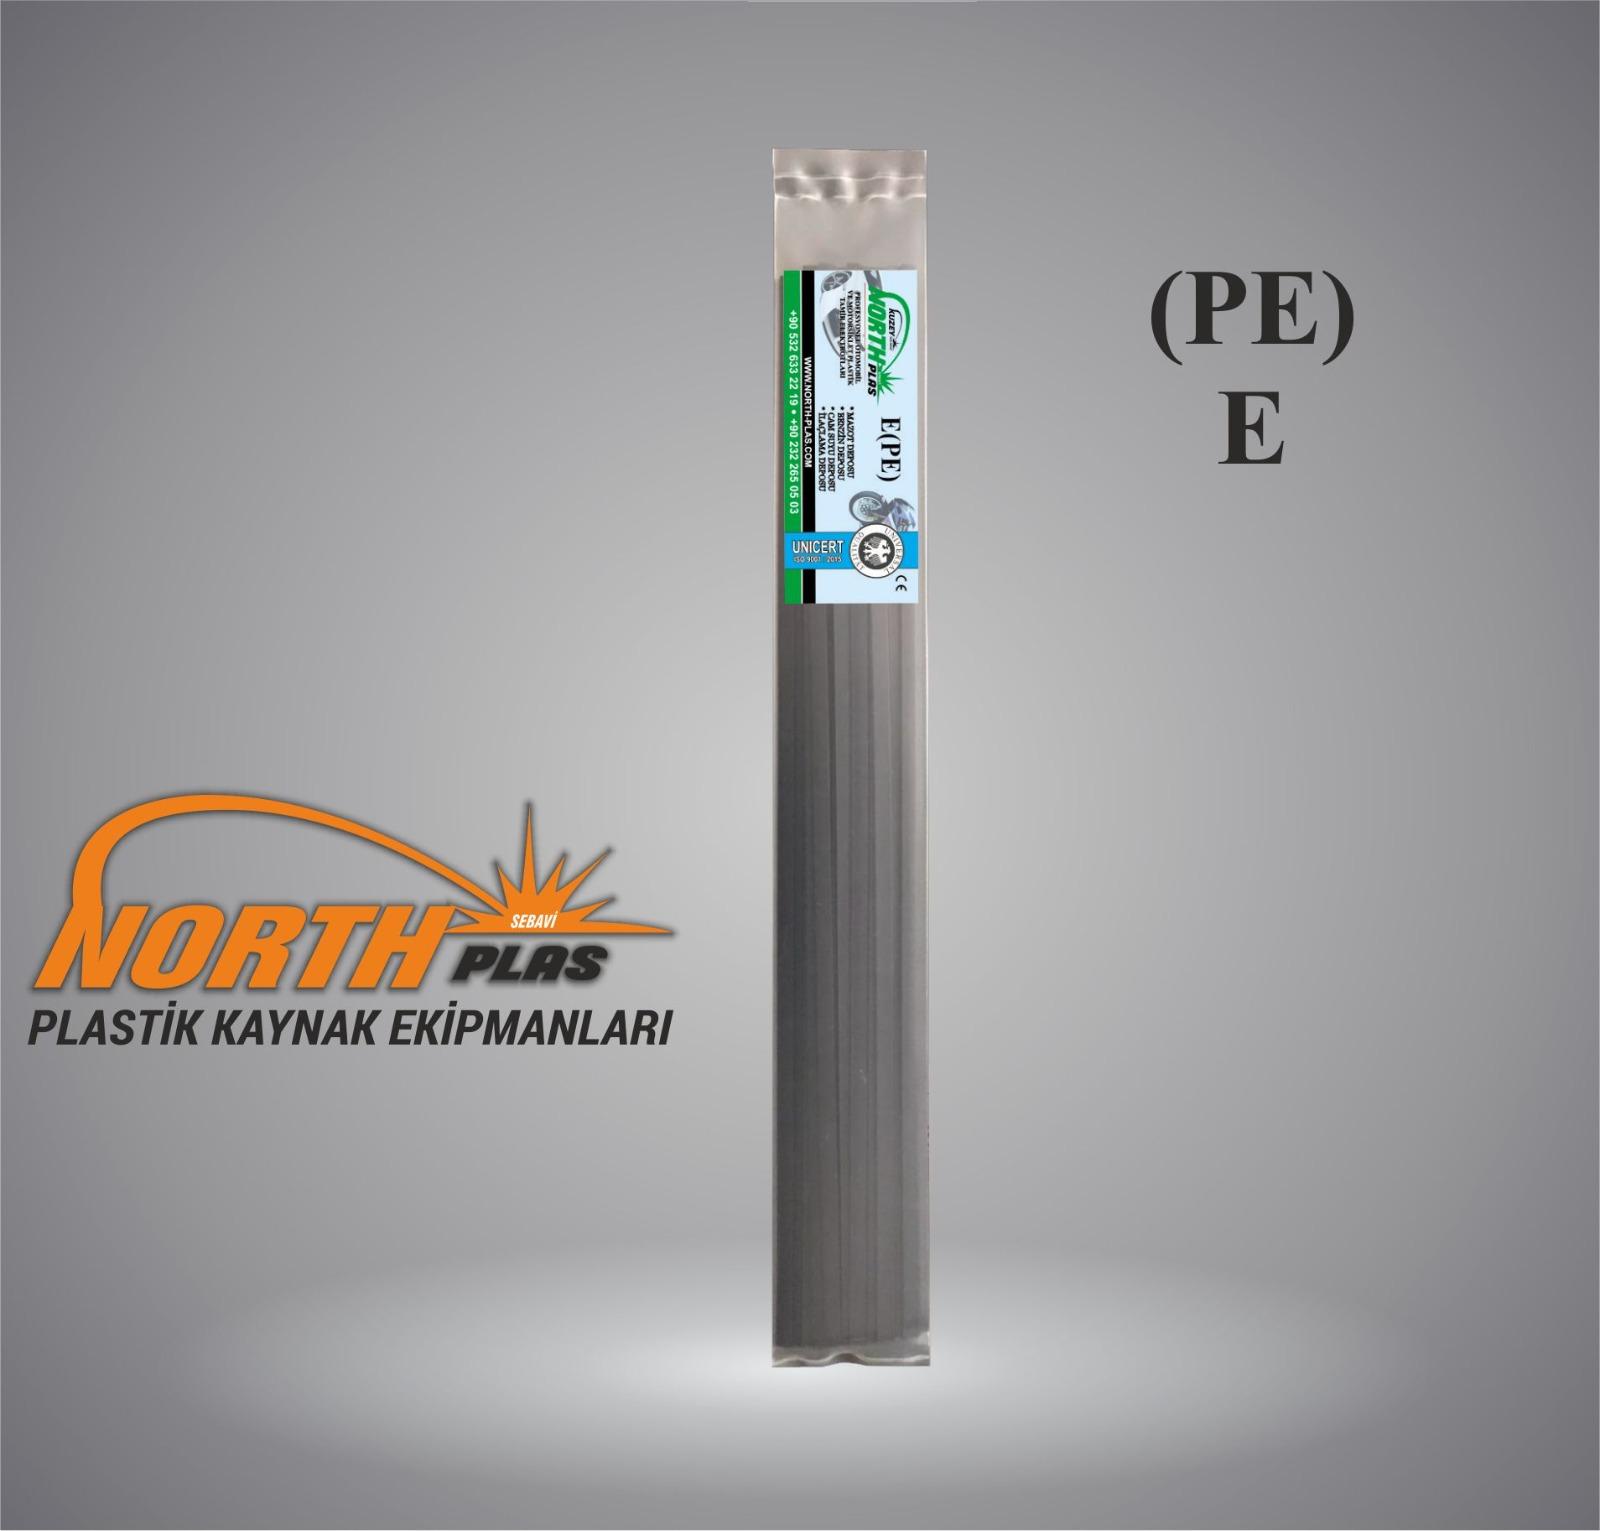 North Plas (E) PE (POLİETİLEN)GENİŞ SİYAH 11 MM PAKET İÇİ 15 ADET  Plastik Kaynak Elektrot